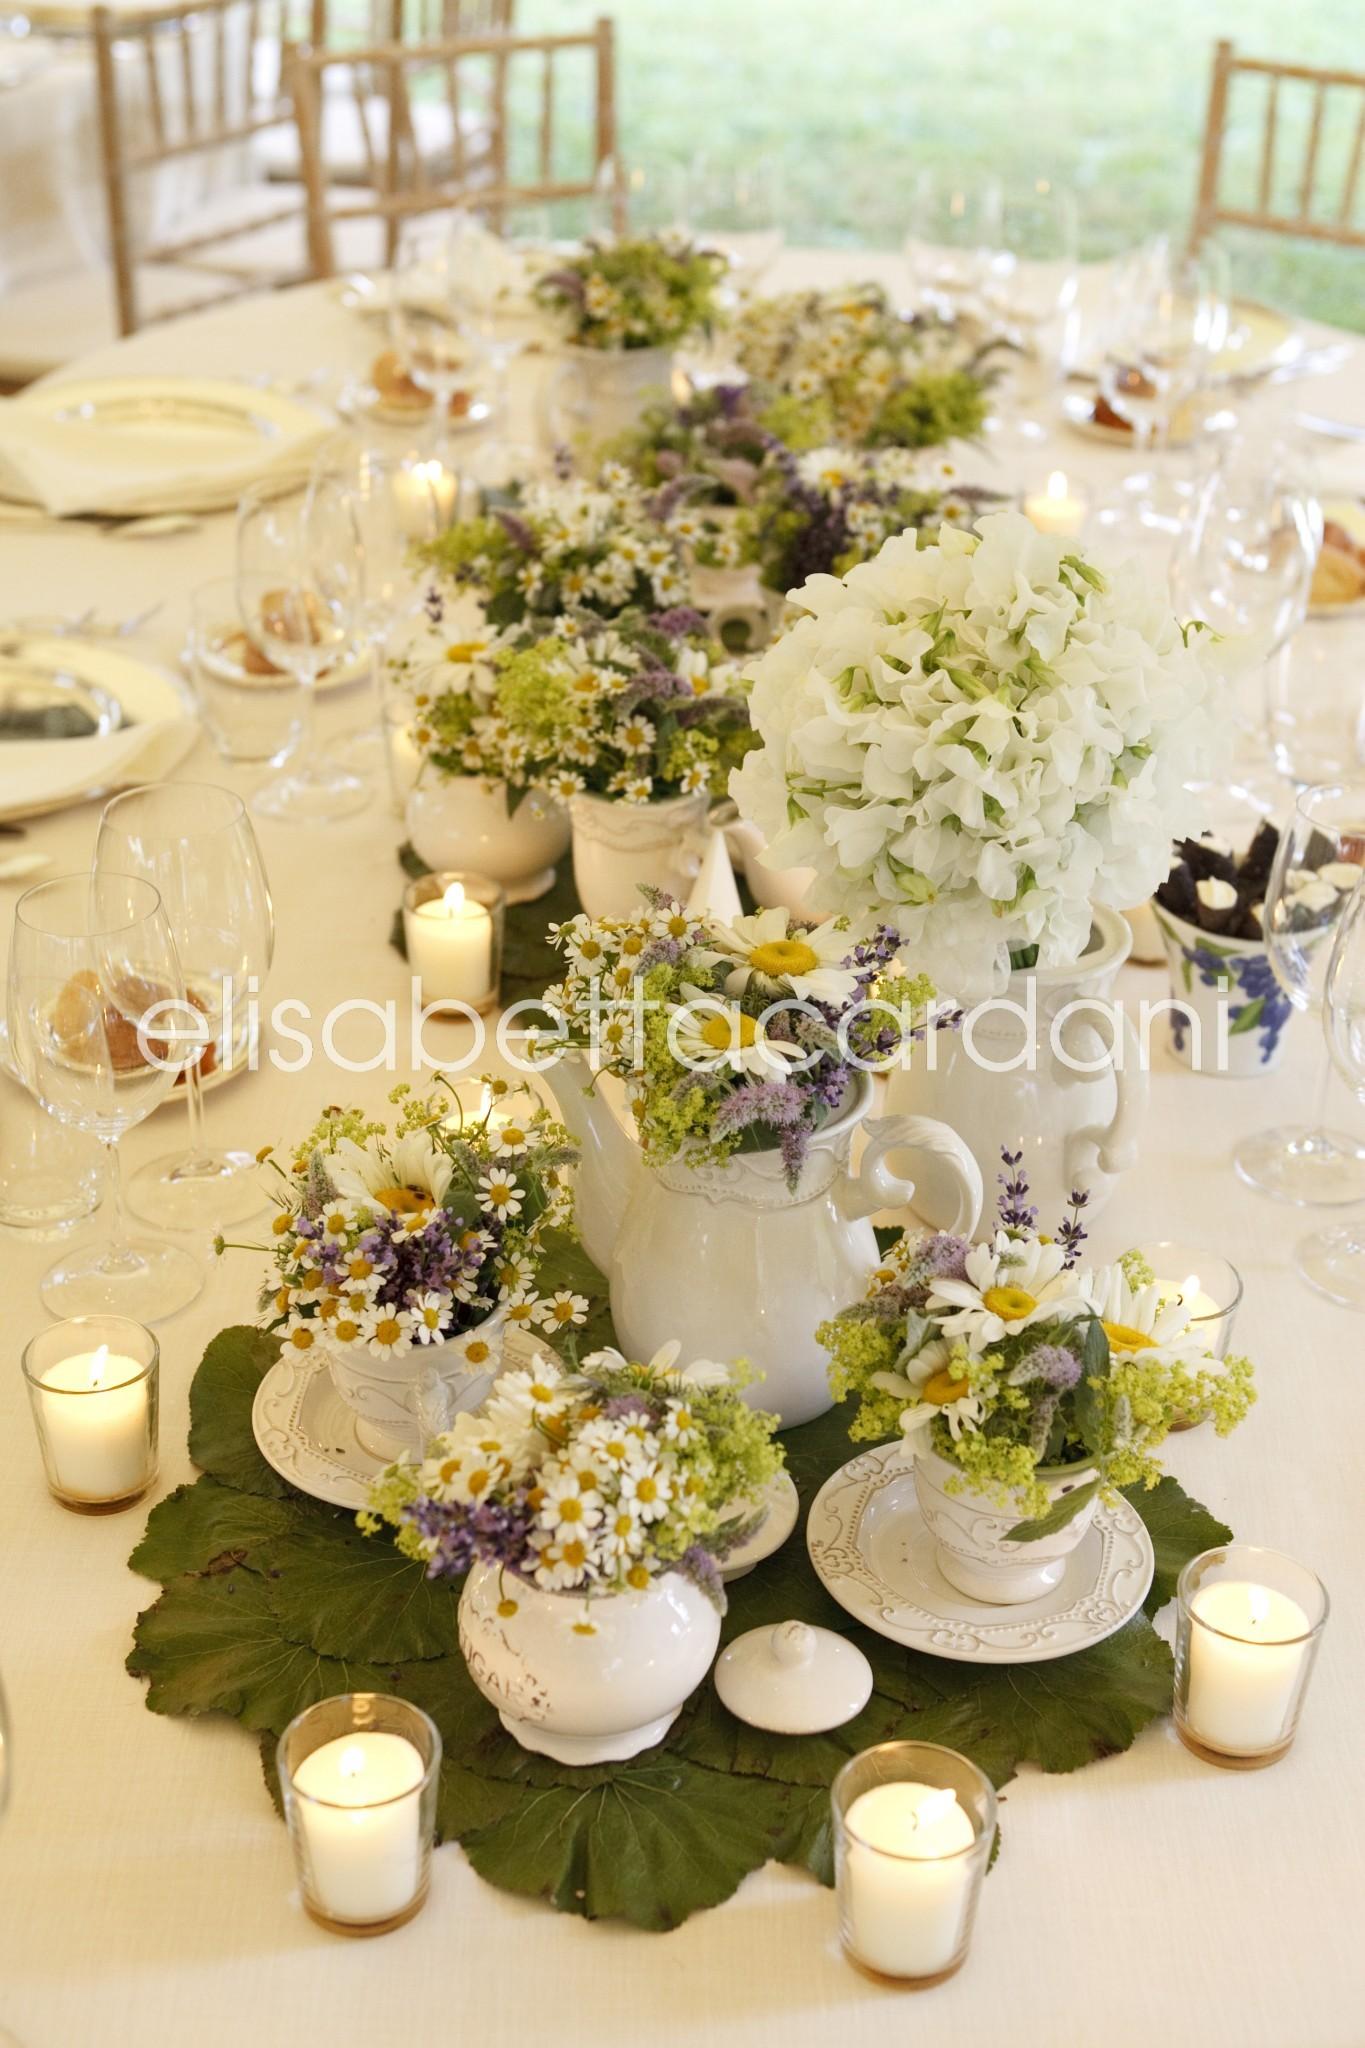 Matrimonio In Giardino : Matrimonio in giardino